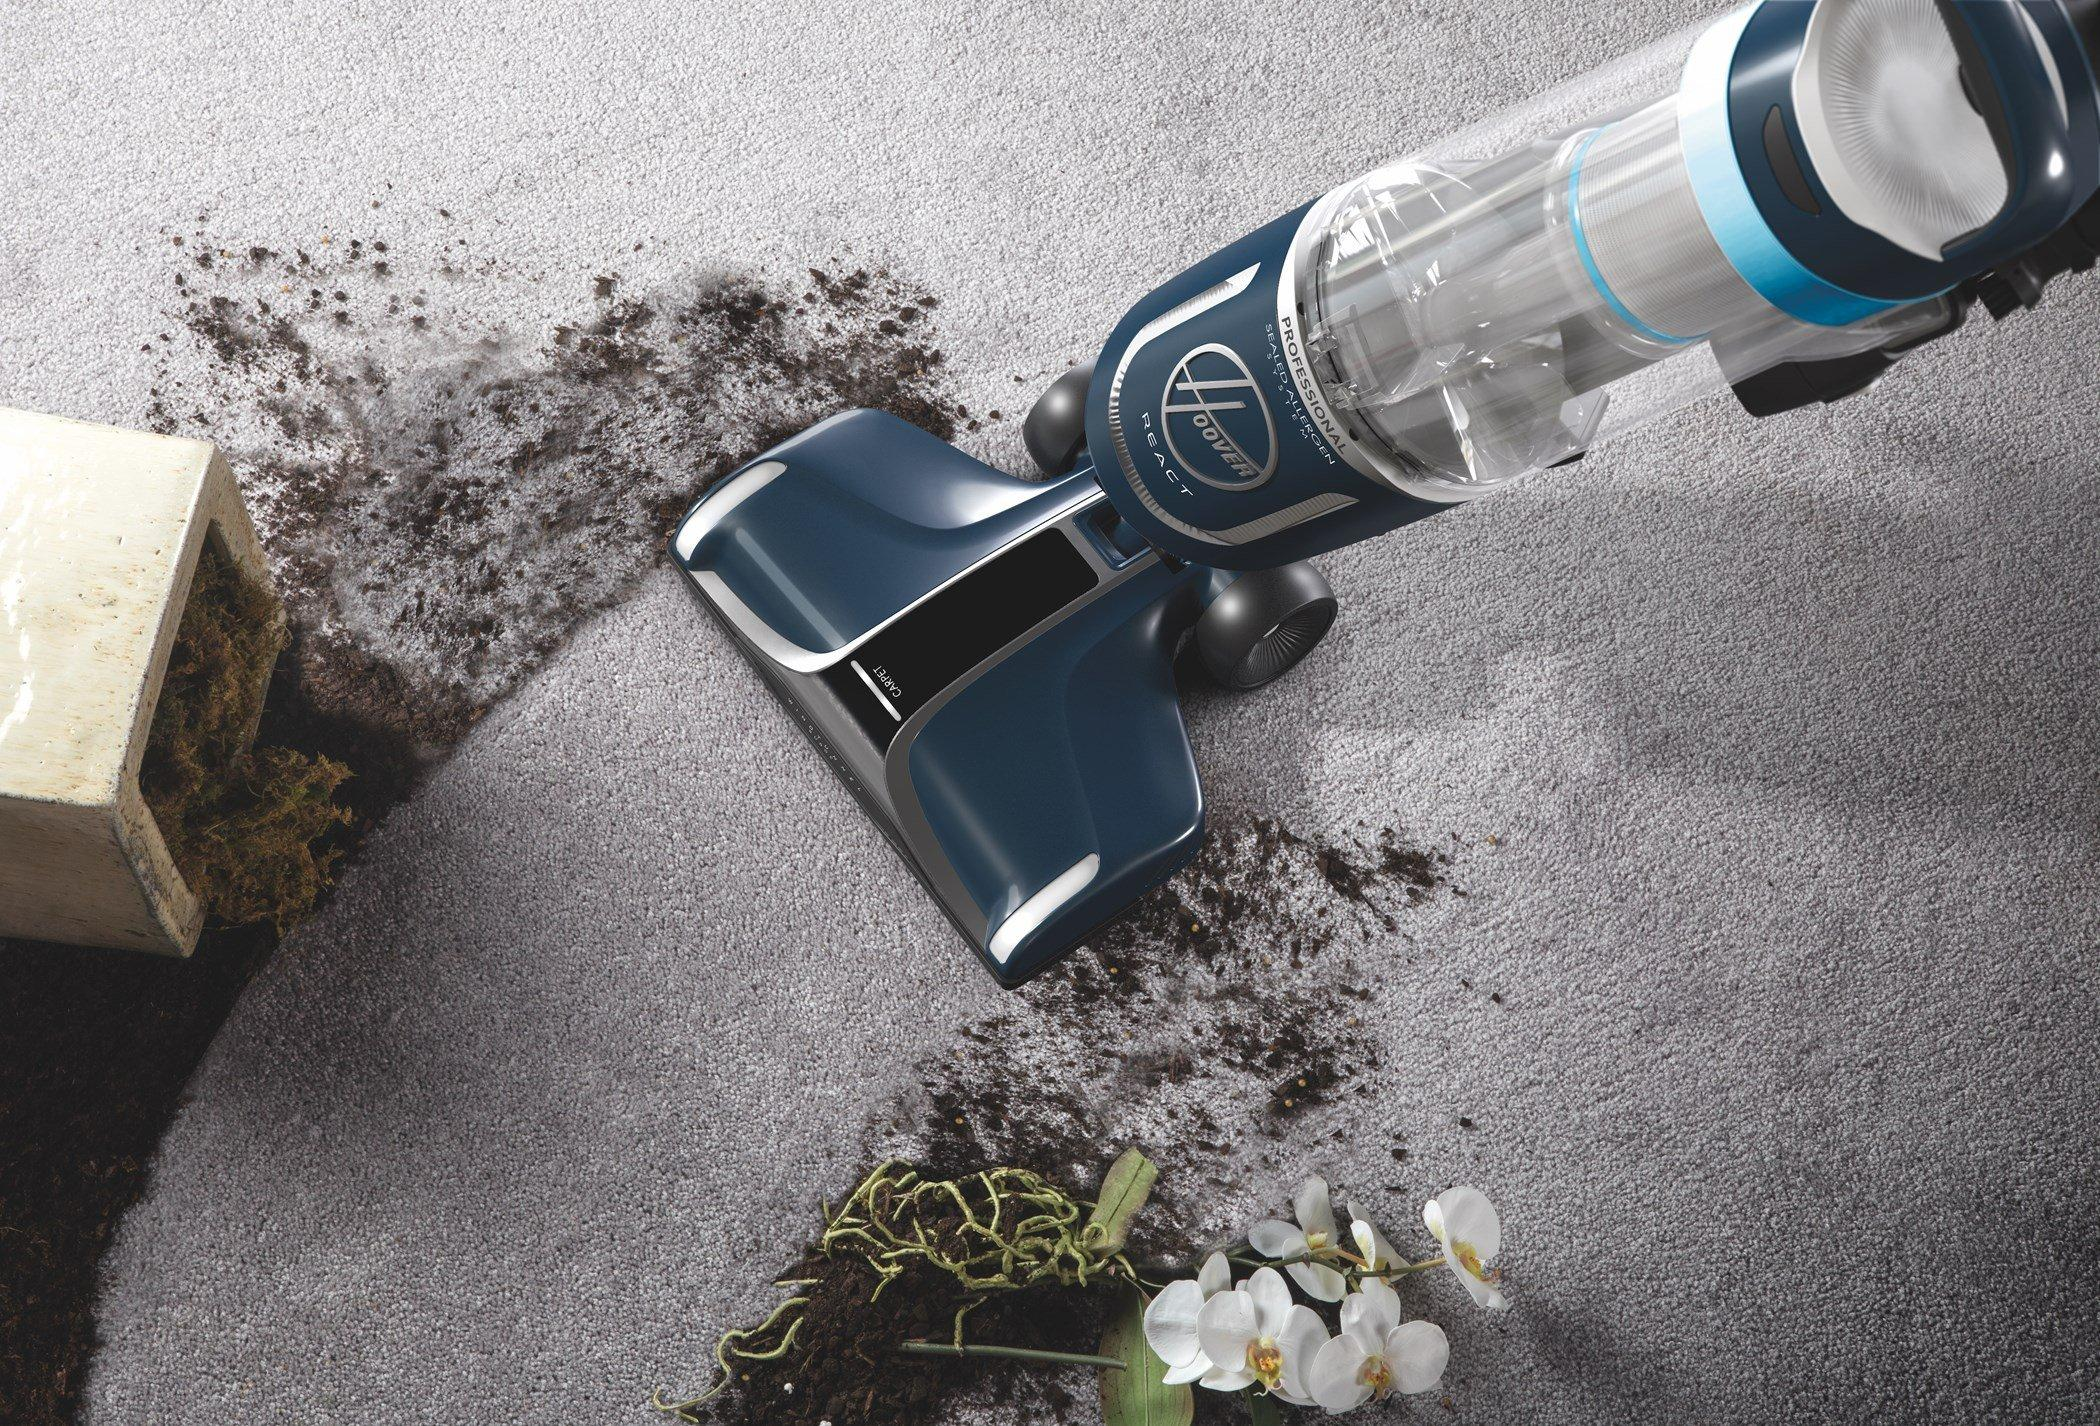 REACT Professional Pet Upright Vacuum3